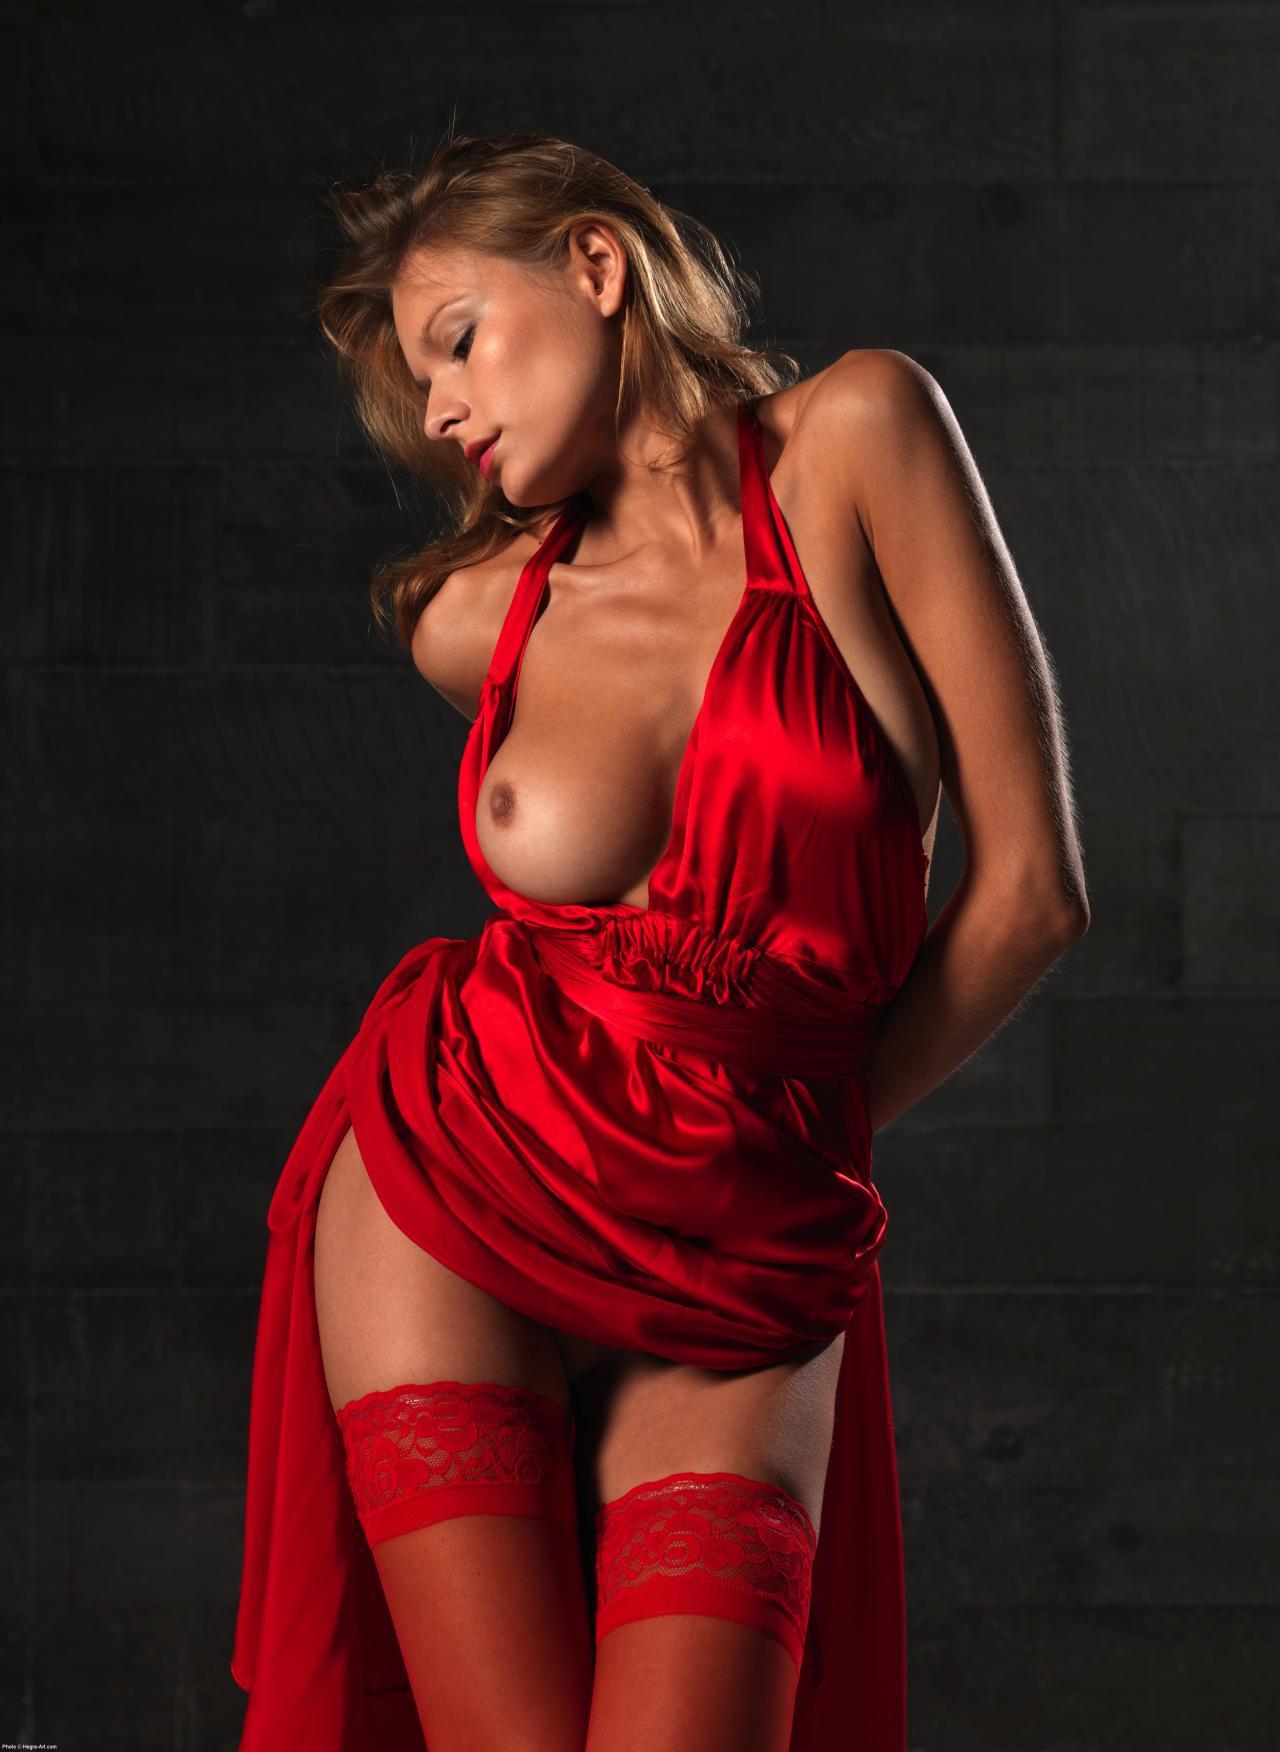 Jenny M Hanna Nude pretty via nude art pictures - porn art pics